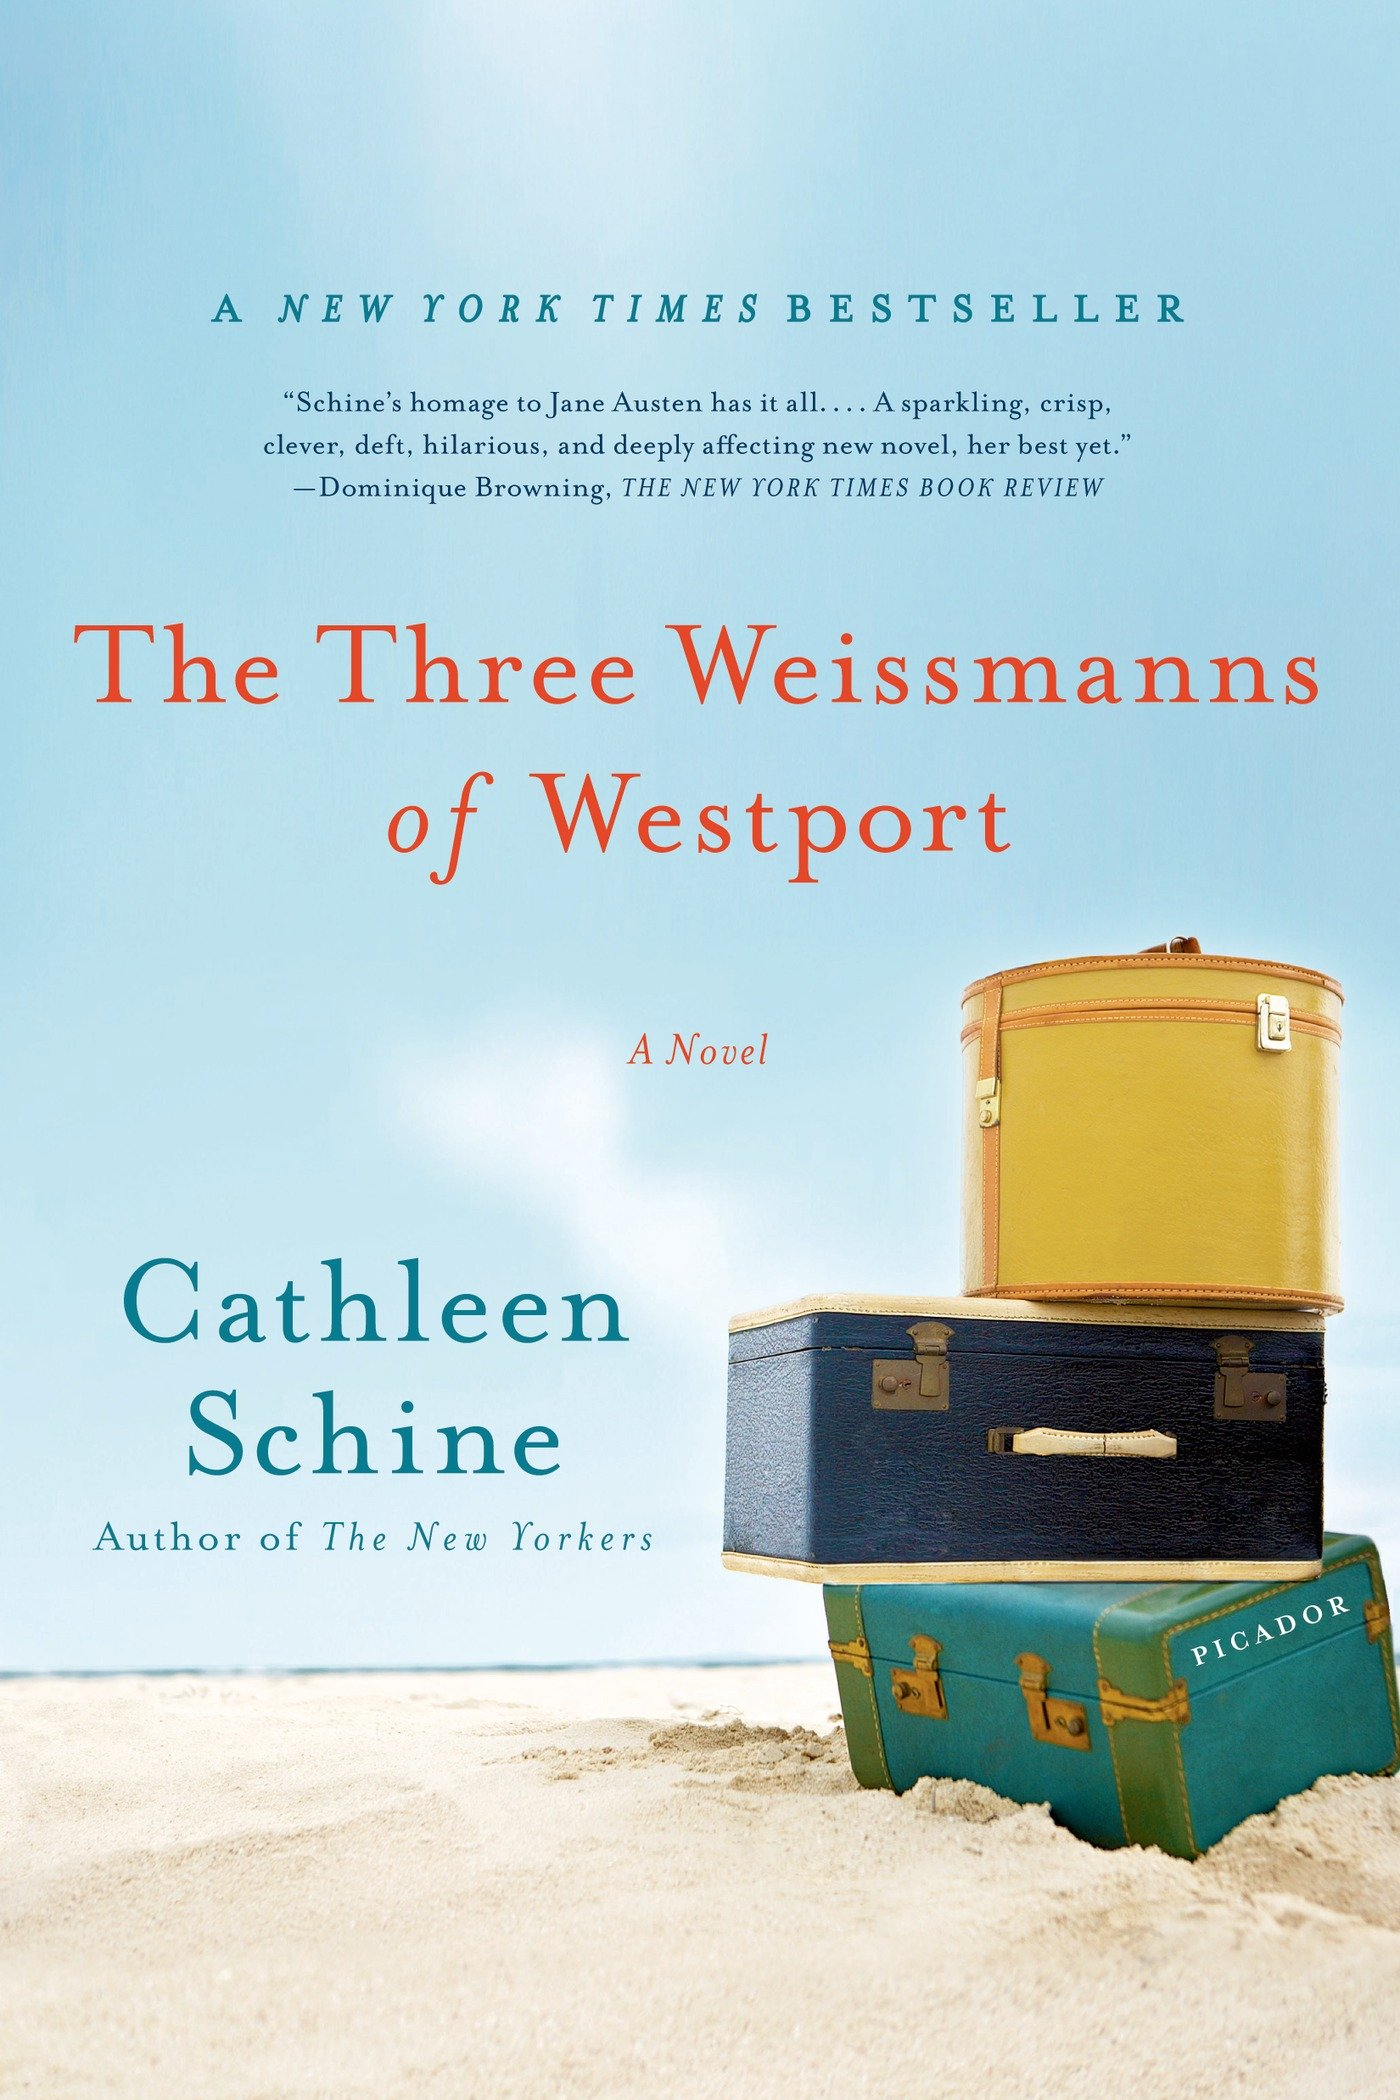 Download The Three Weissmanns of Westport: A Novel pdf